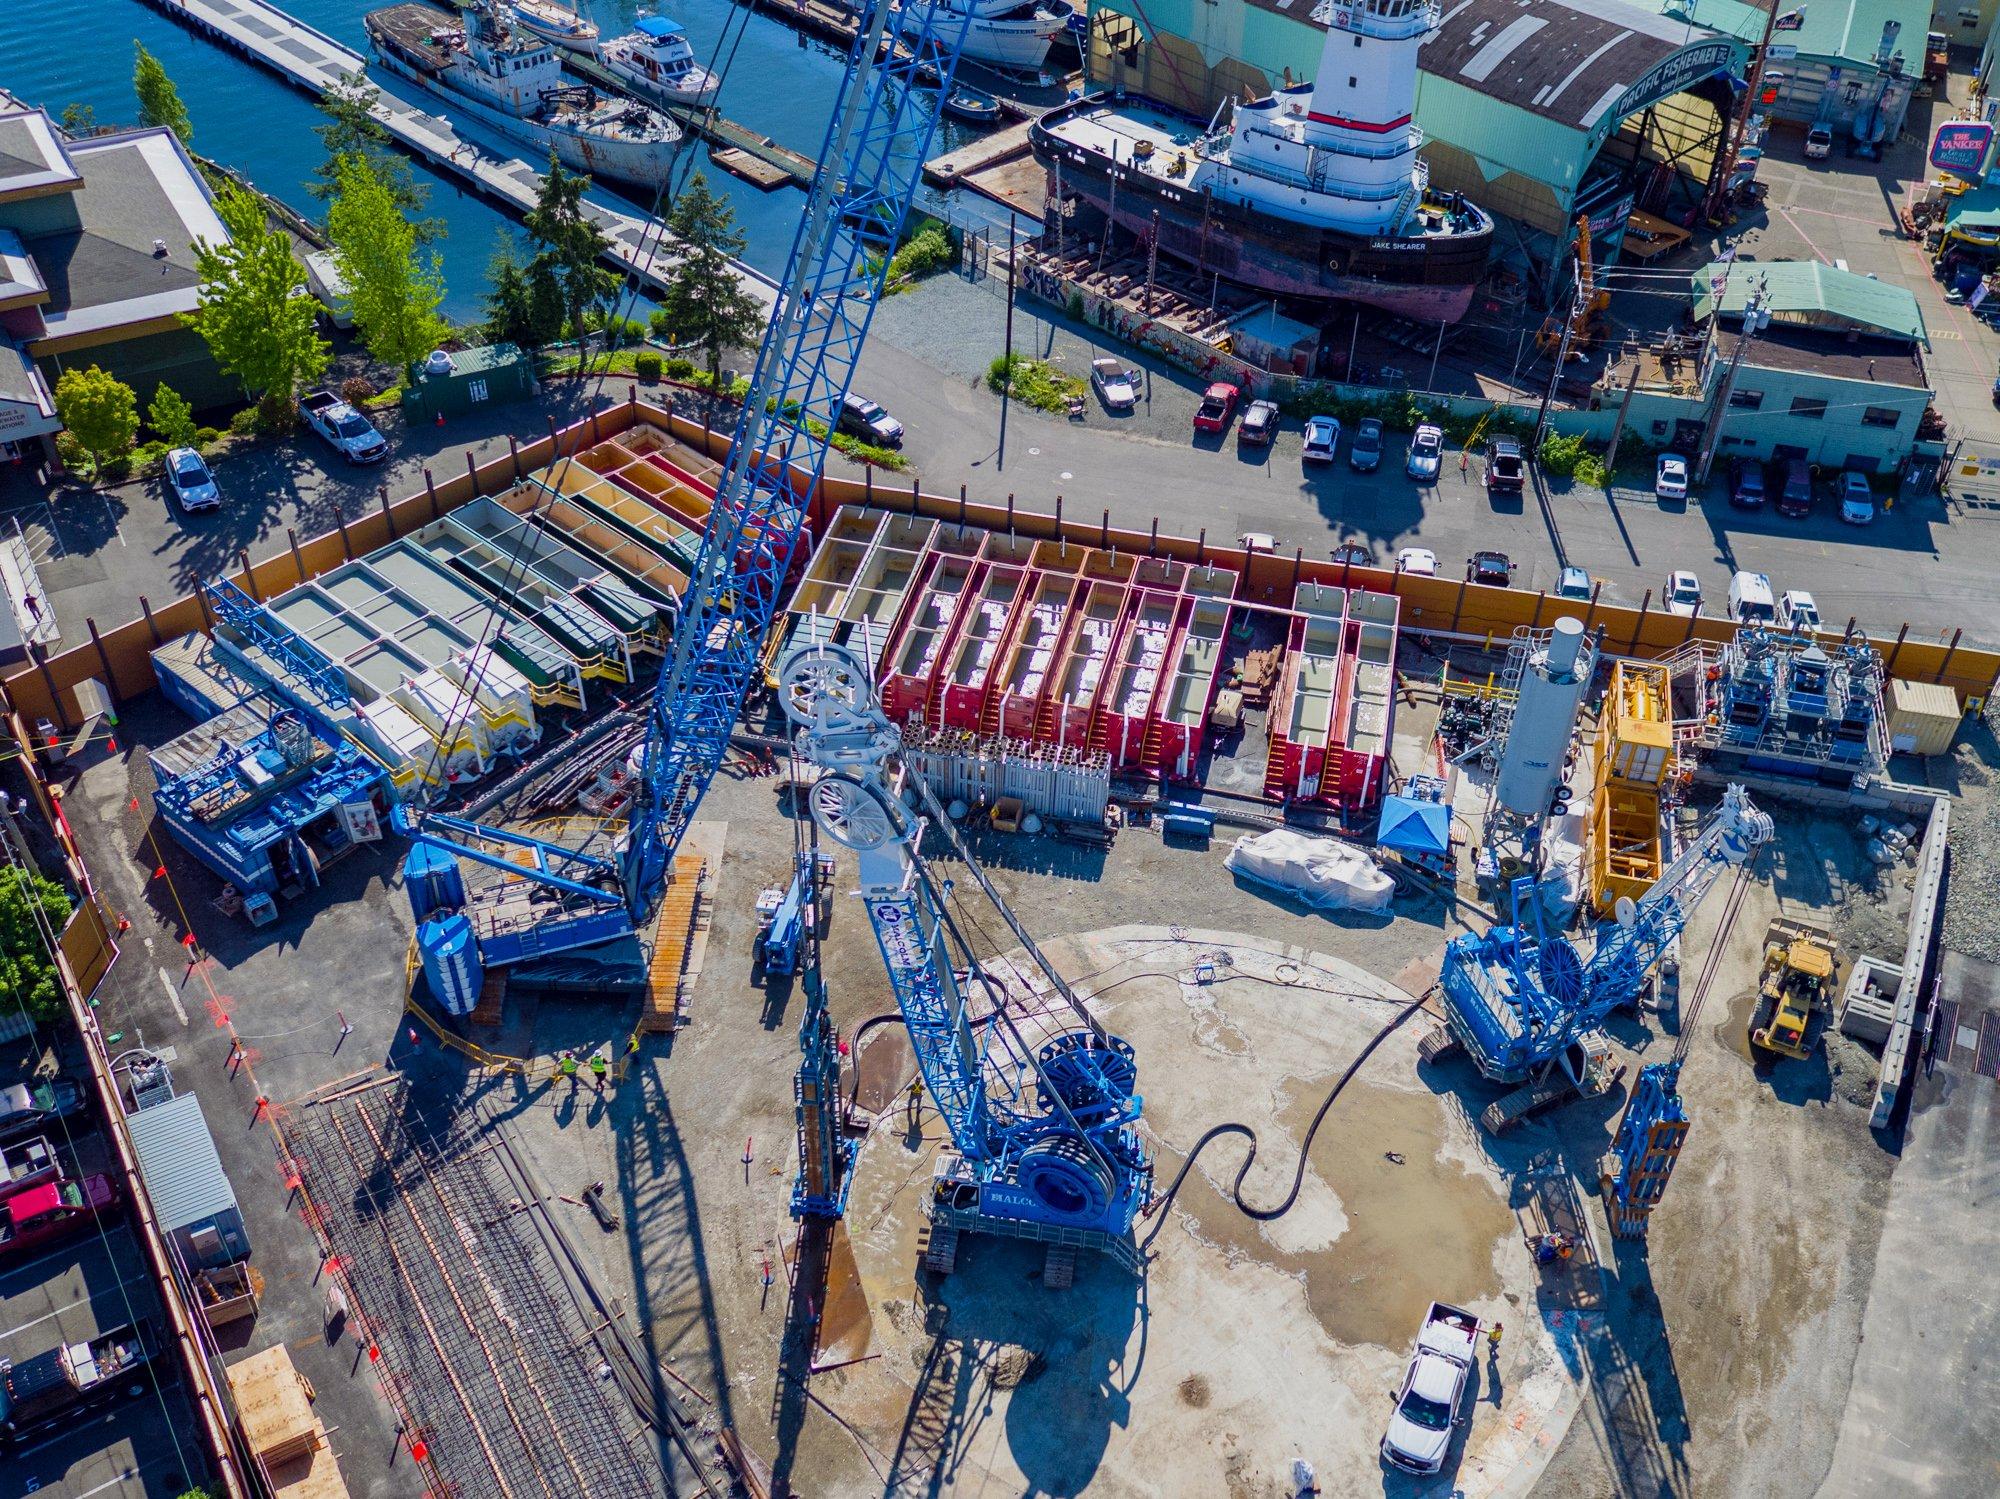 Protecting Seattle's Waterways